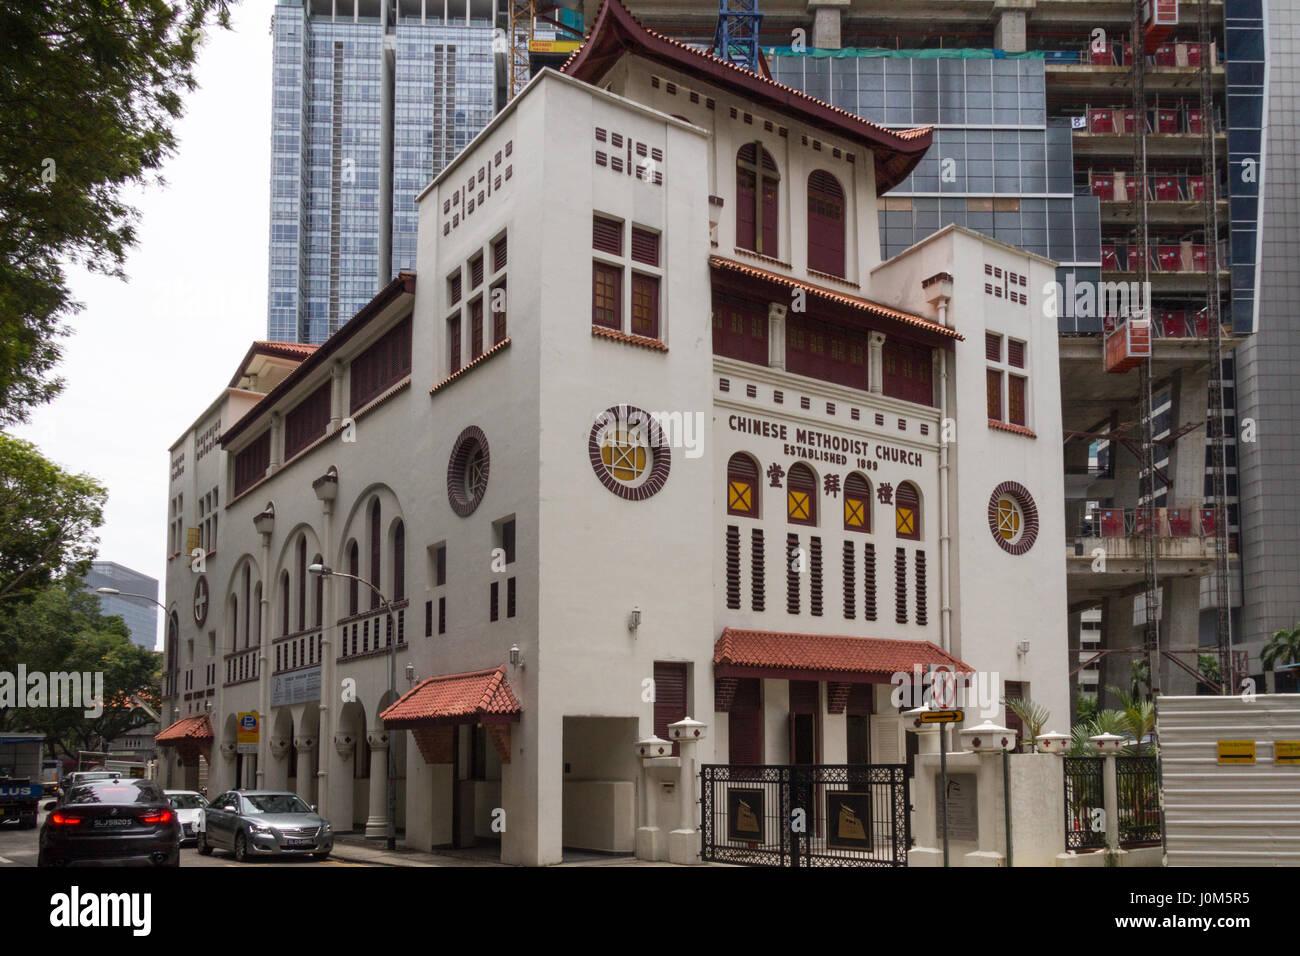 Chinese Methodist Church on Telok Ayer street in Singapore - Stock Image